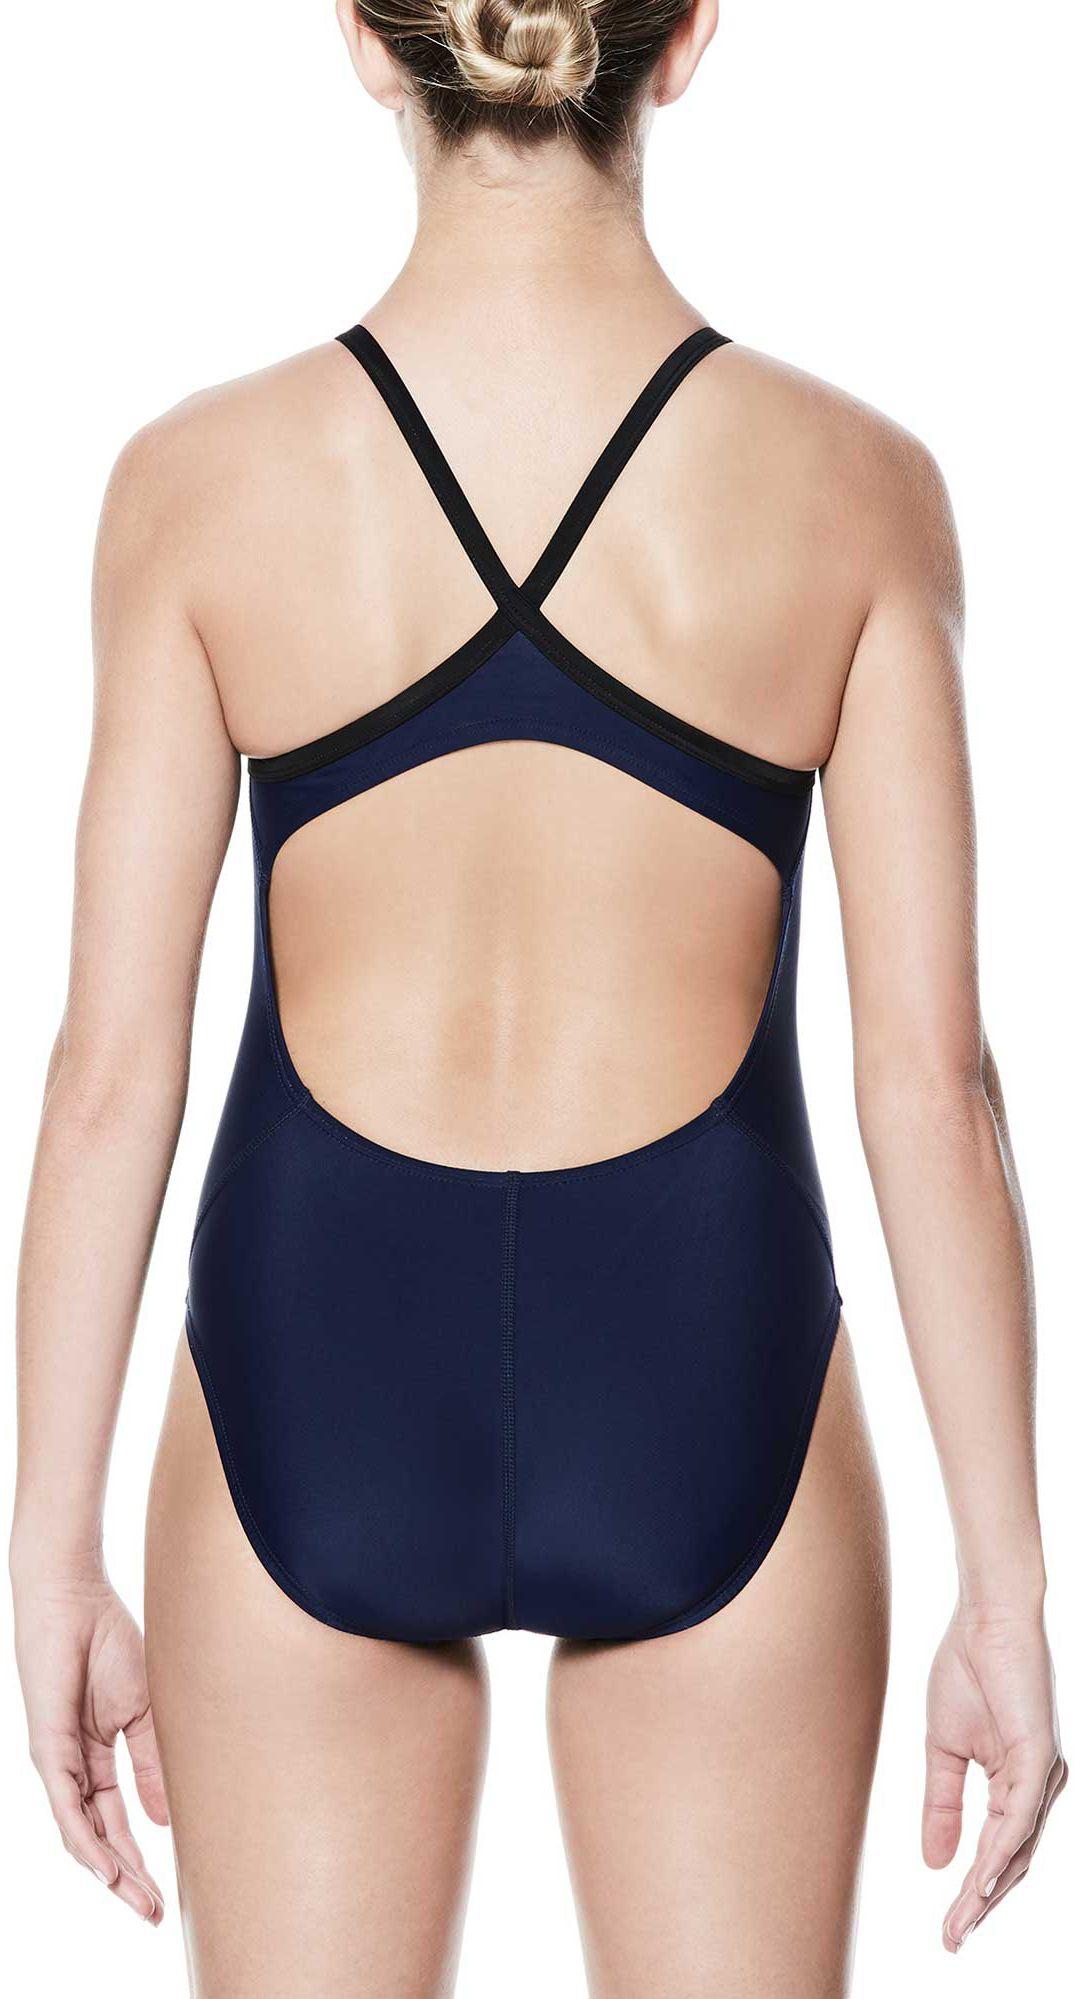 83bc9a873ba Nike Women's Nylon Core Solid Lingerie Tank Swimsuit